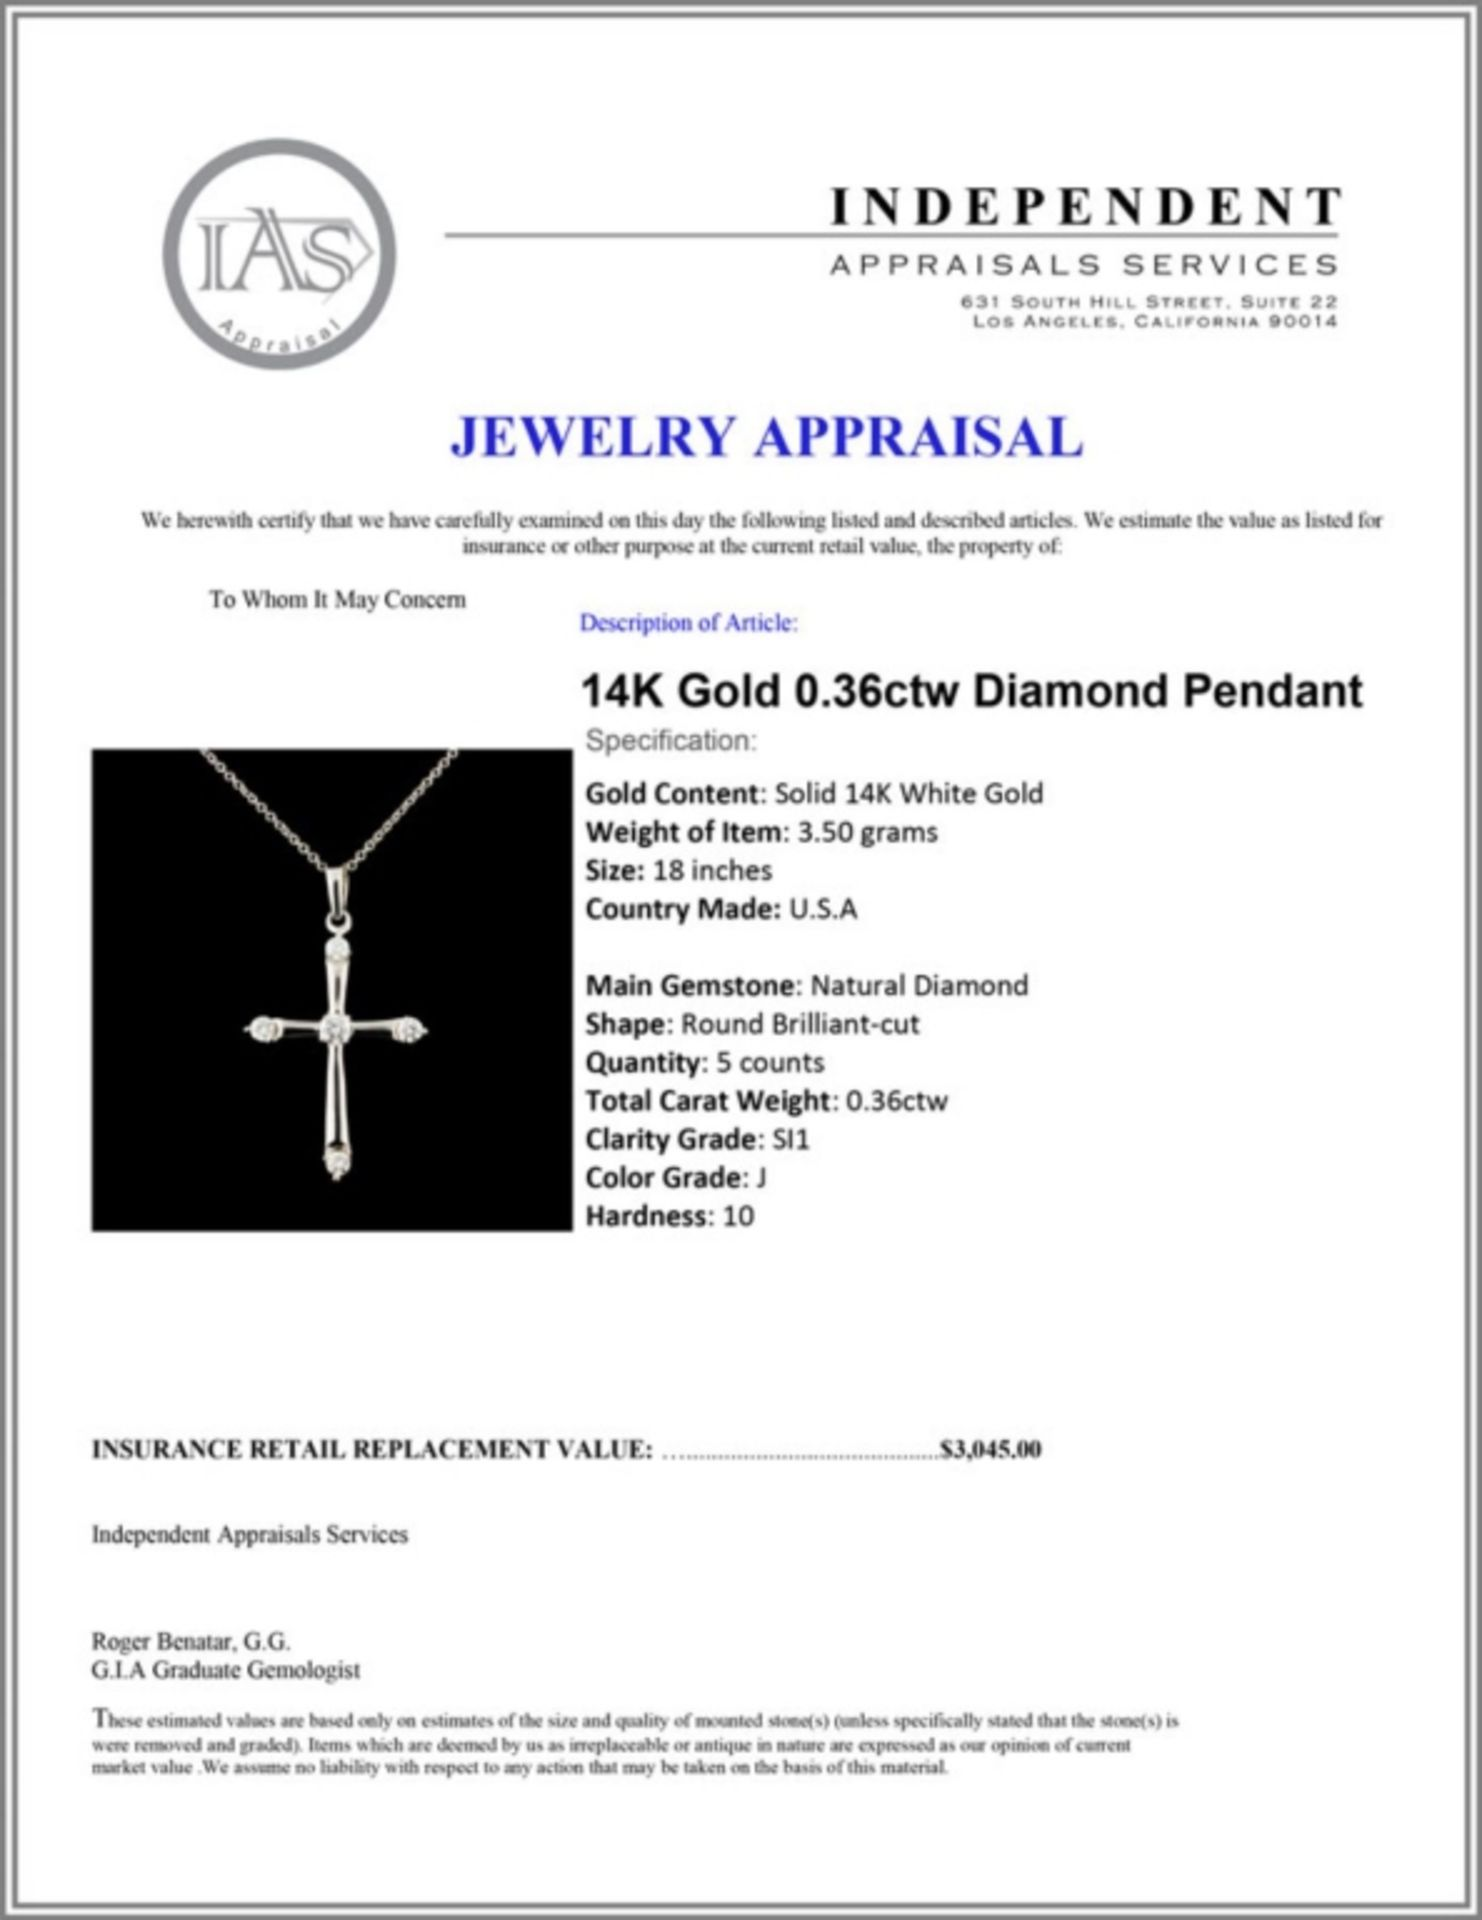 14K Gold 0.36ctw Diamond Pendant - Image 4 of 4